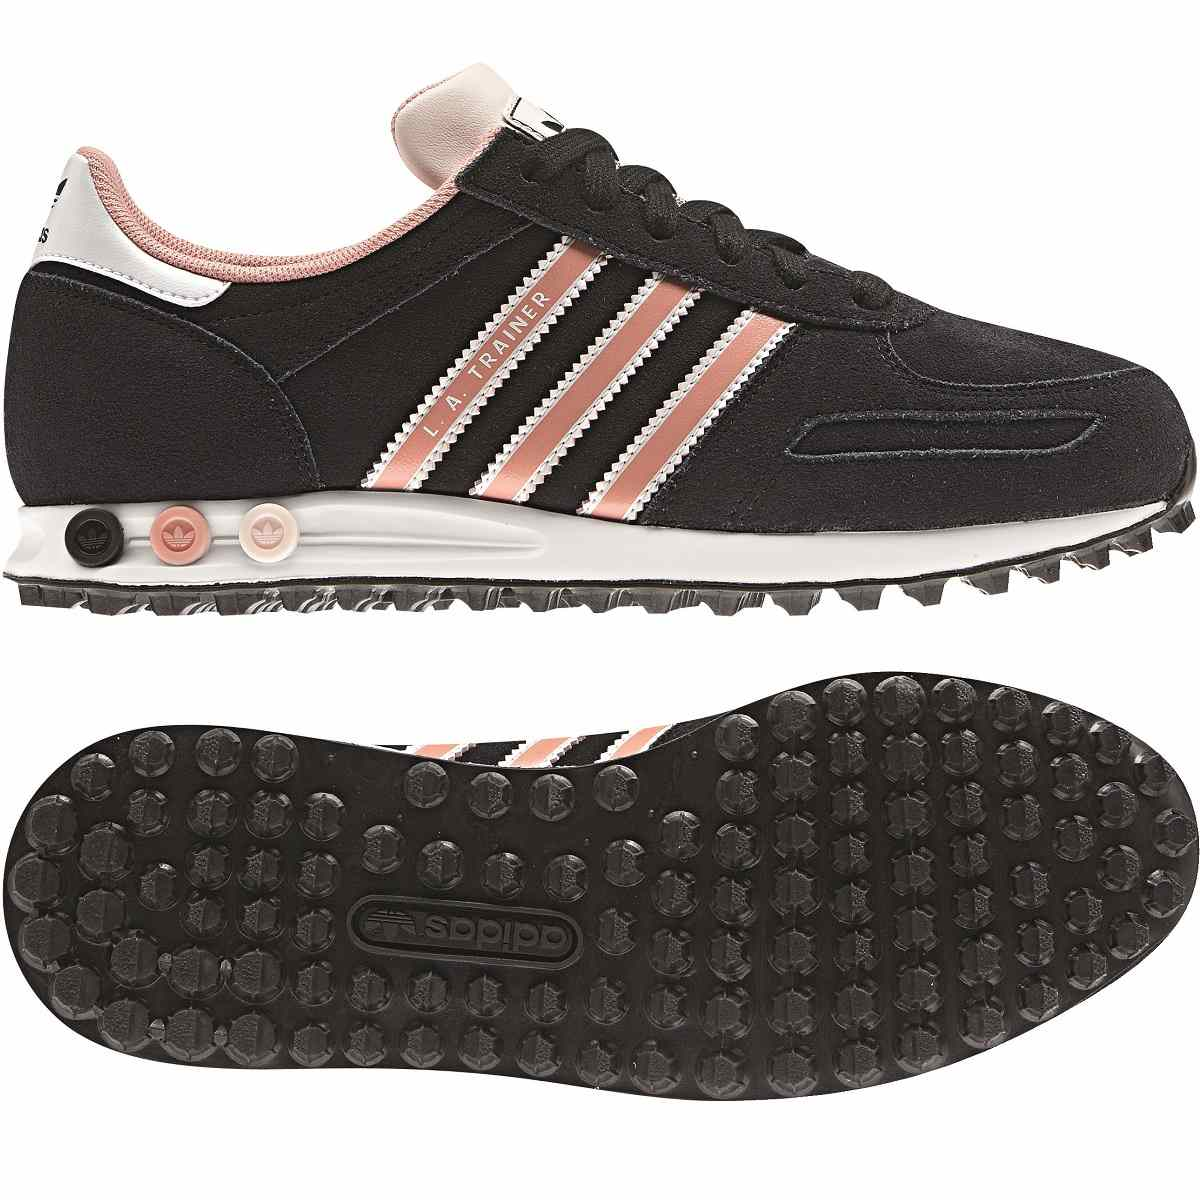 adidas la trainer damen schuhe turnschuhe sneakers schwarz. Black Bedroom Furniture Sets. Home Design Ideas